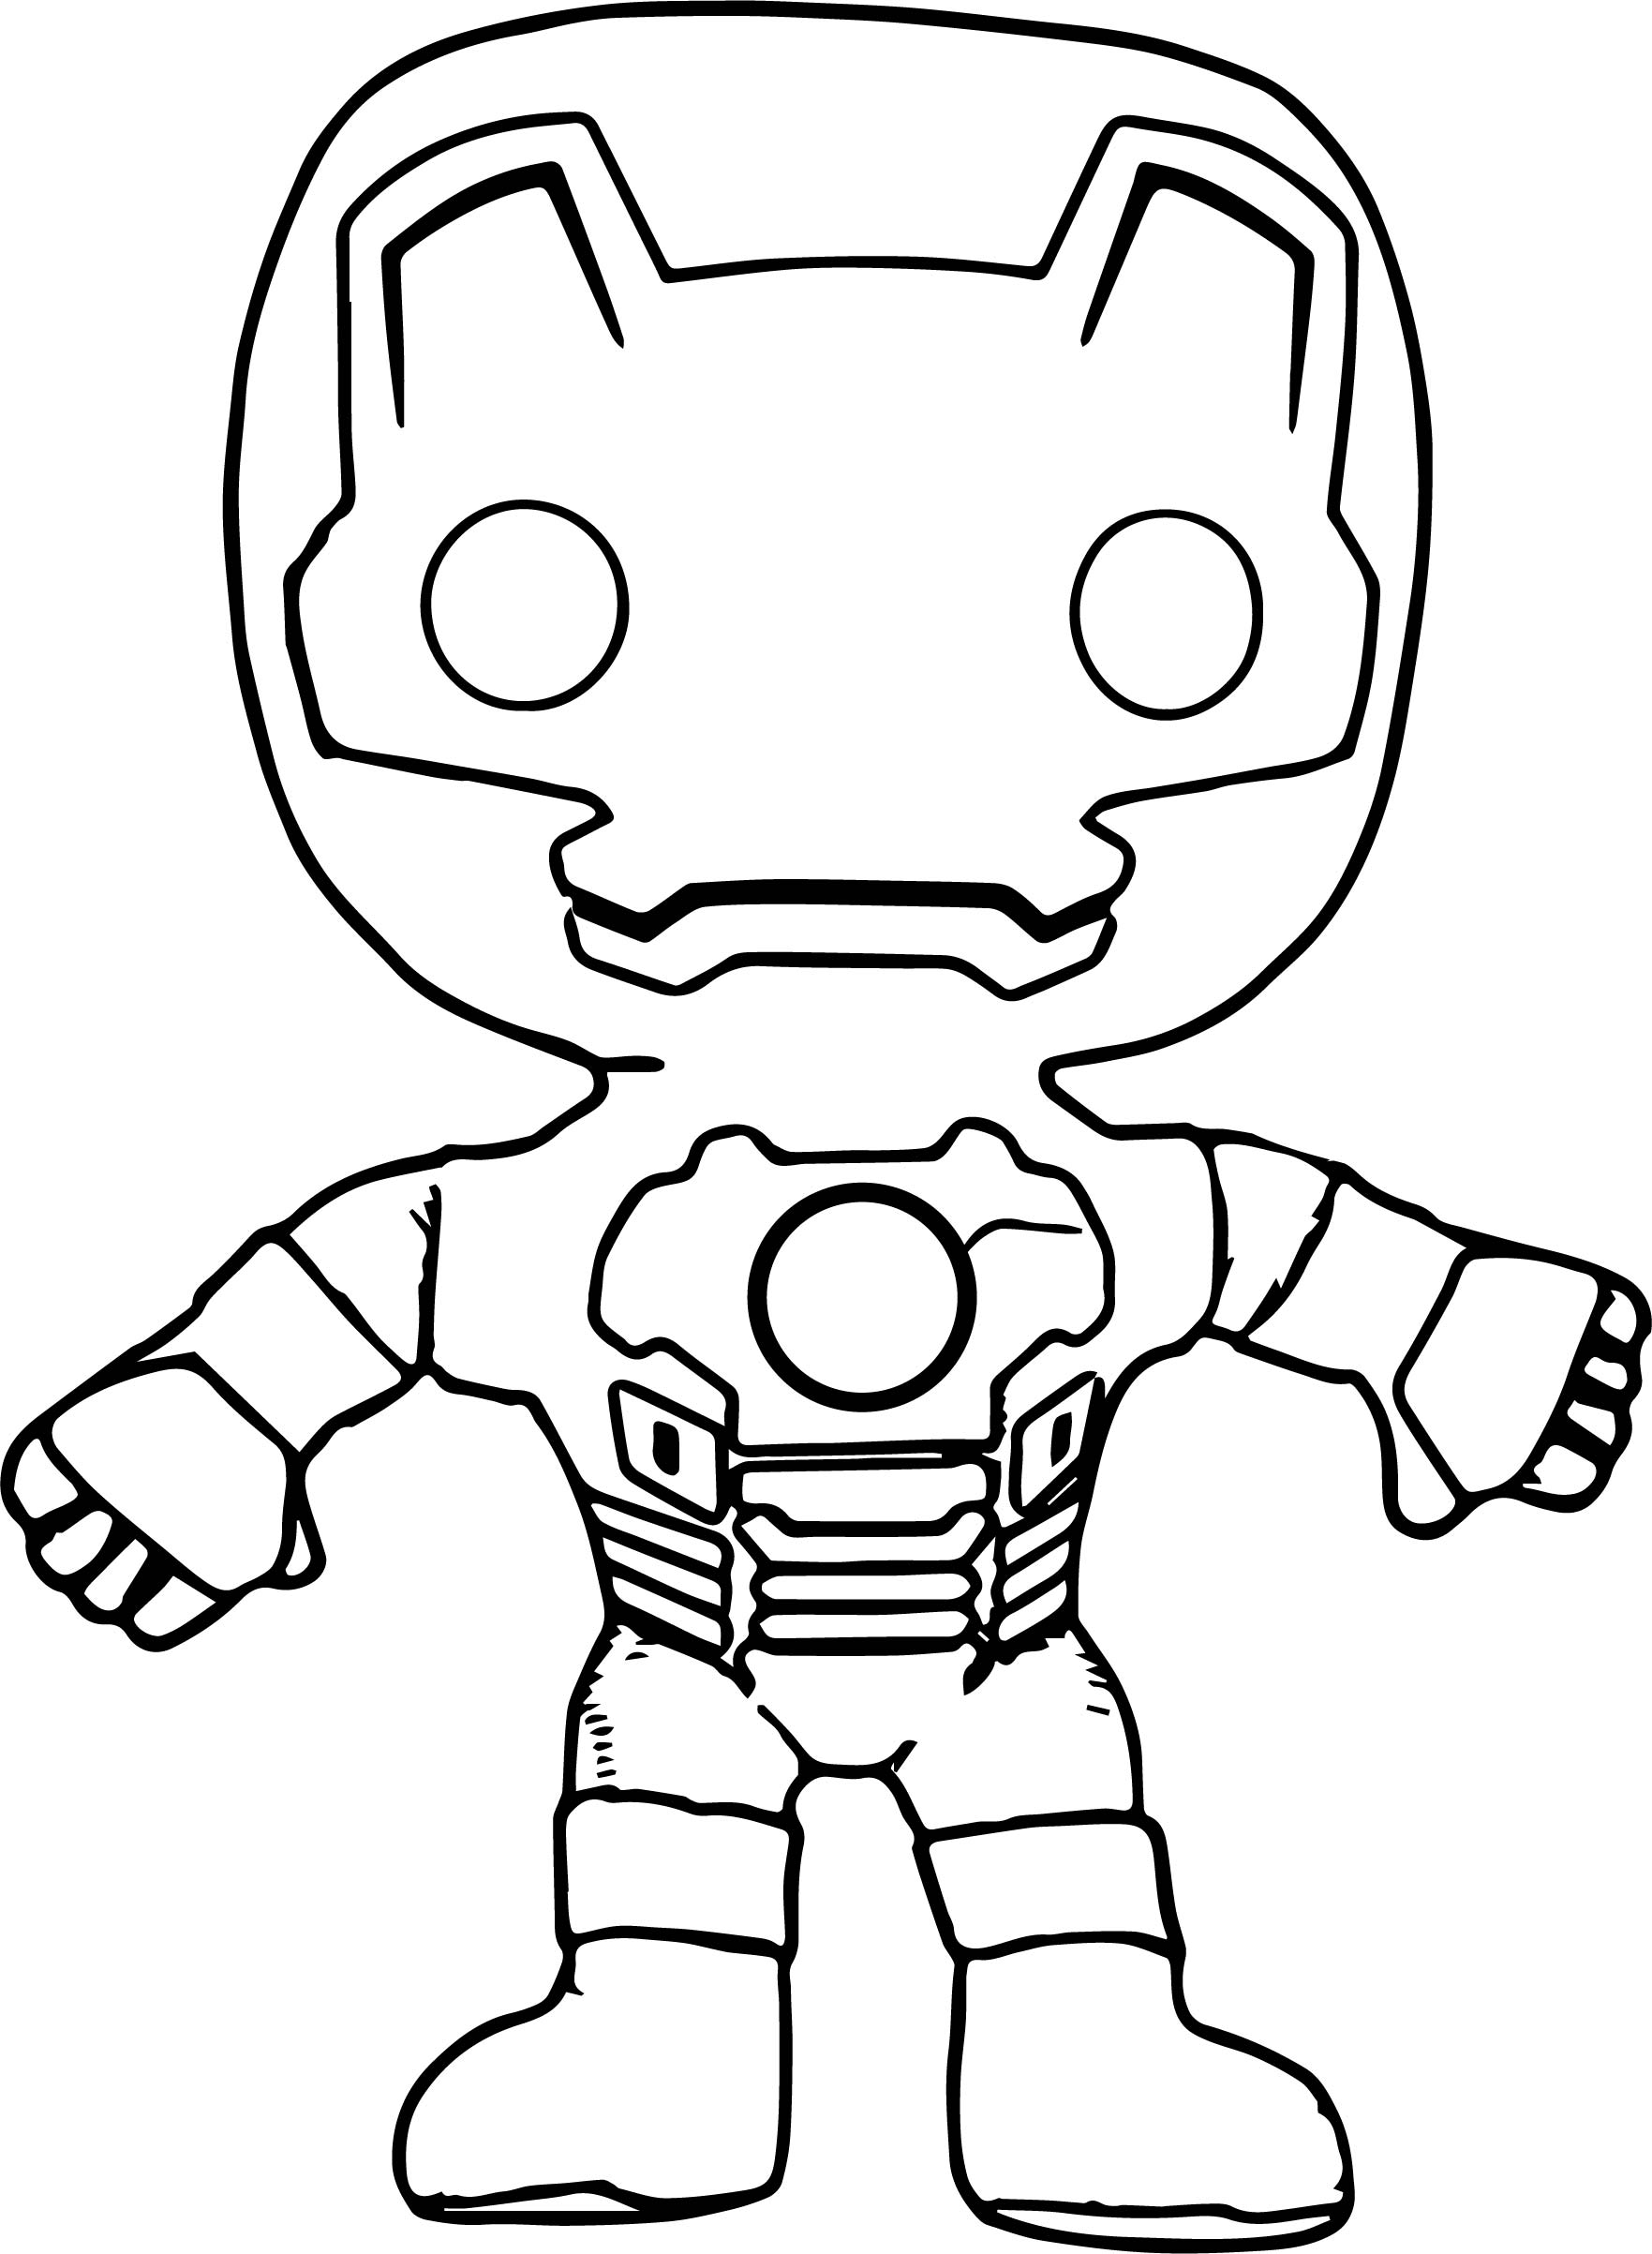 1763x2405 Avengers Iron Man Chibi Coloring Page Wecoloringpage